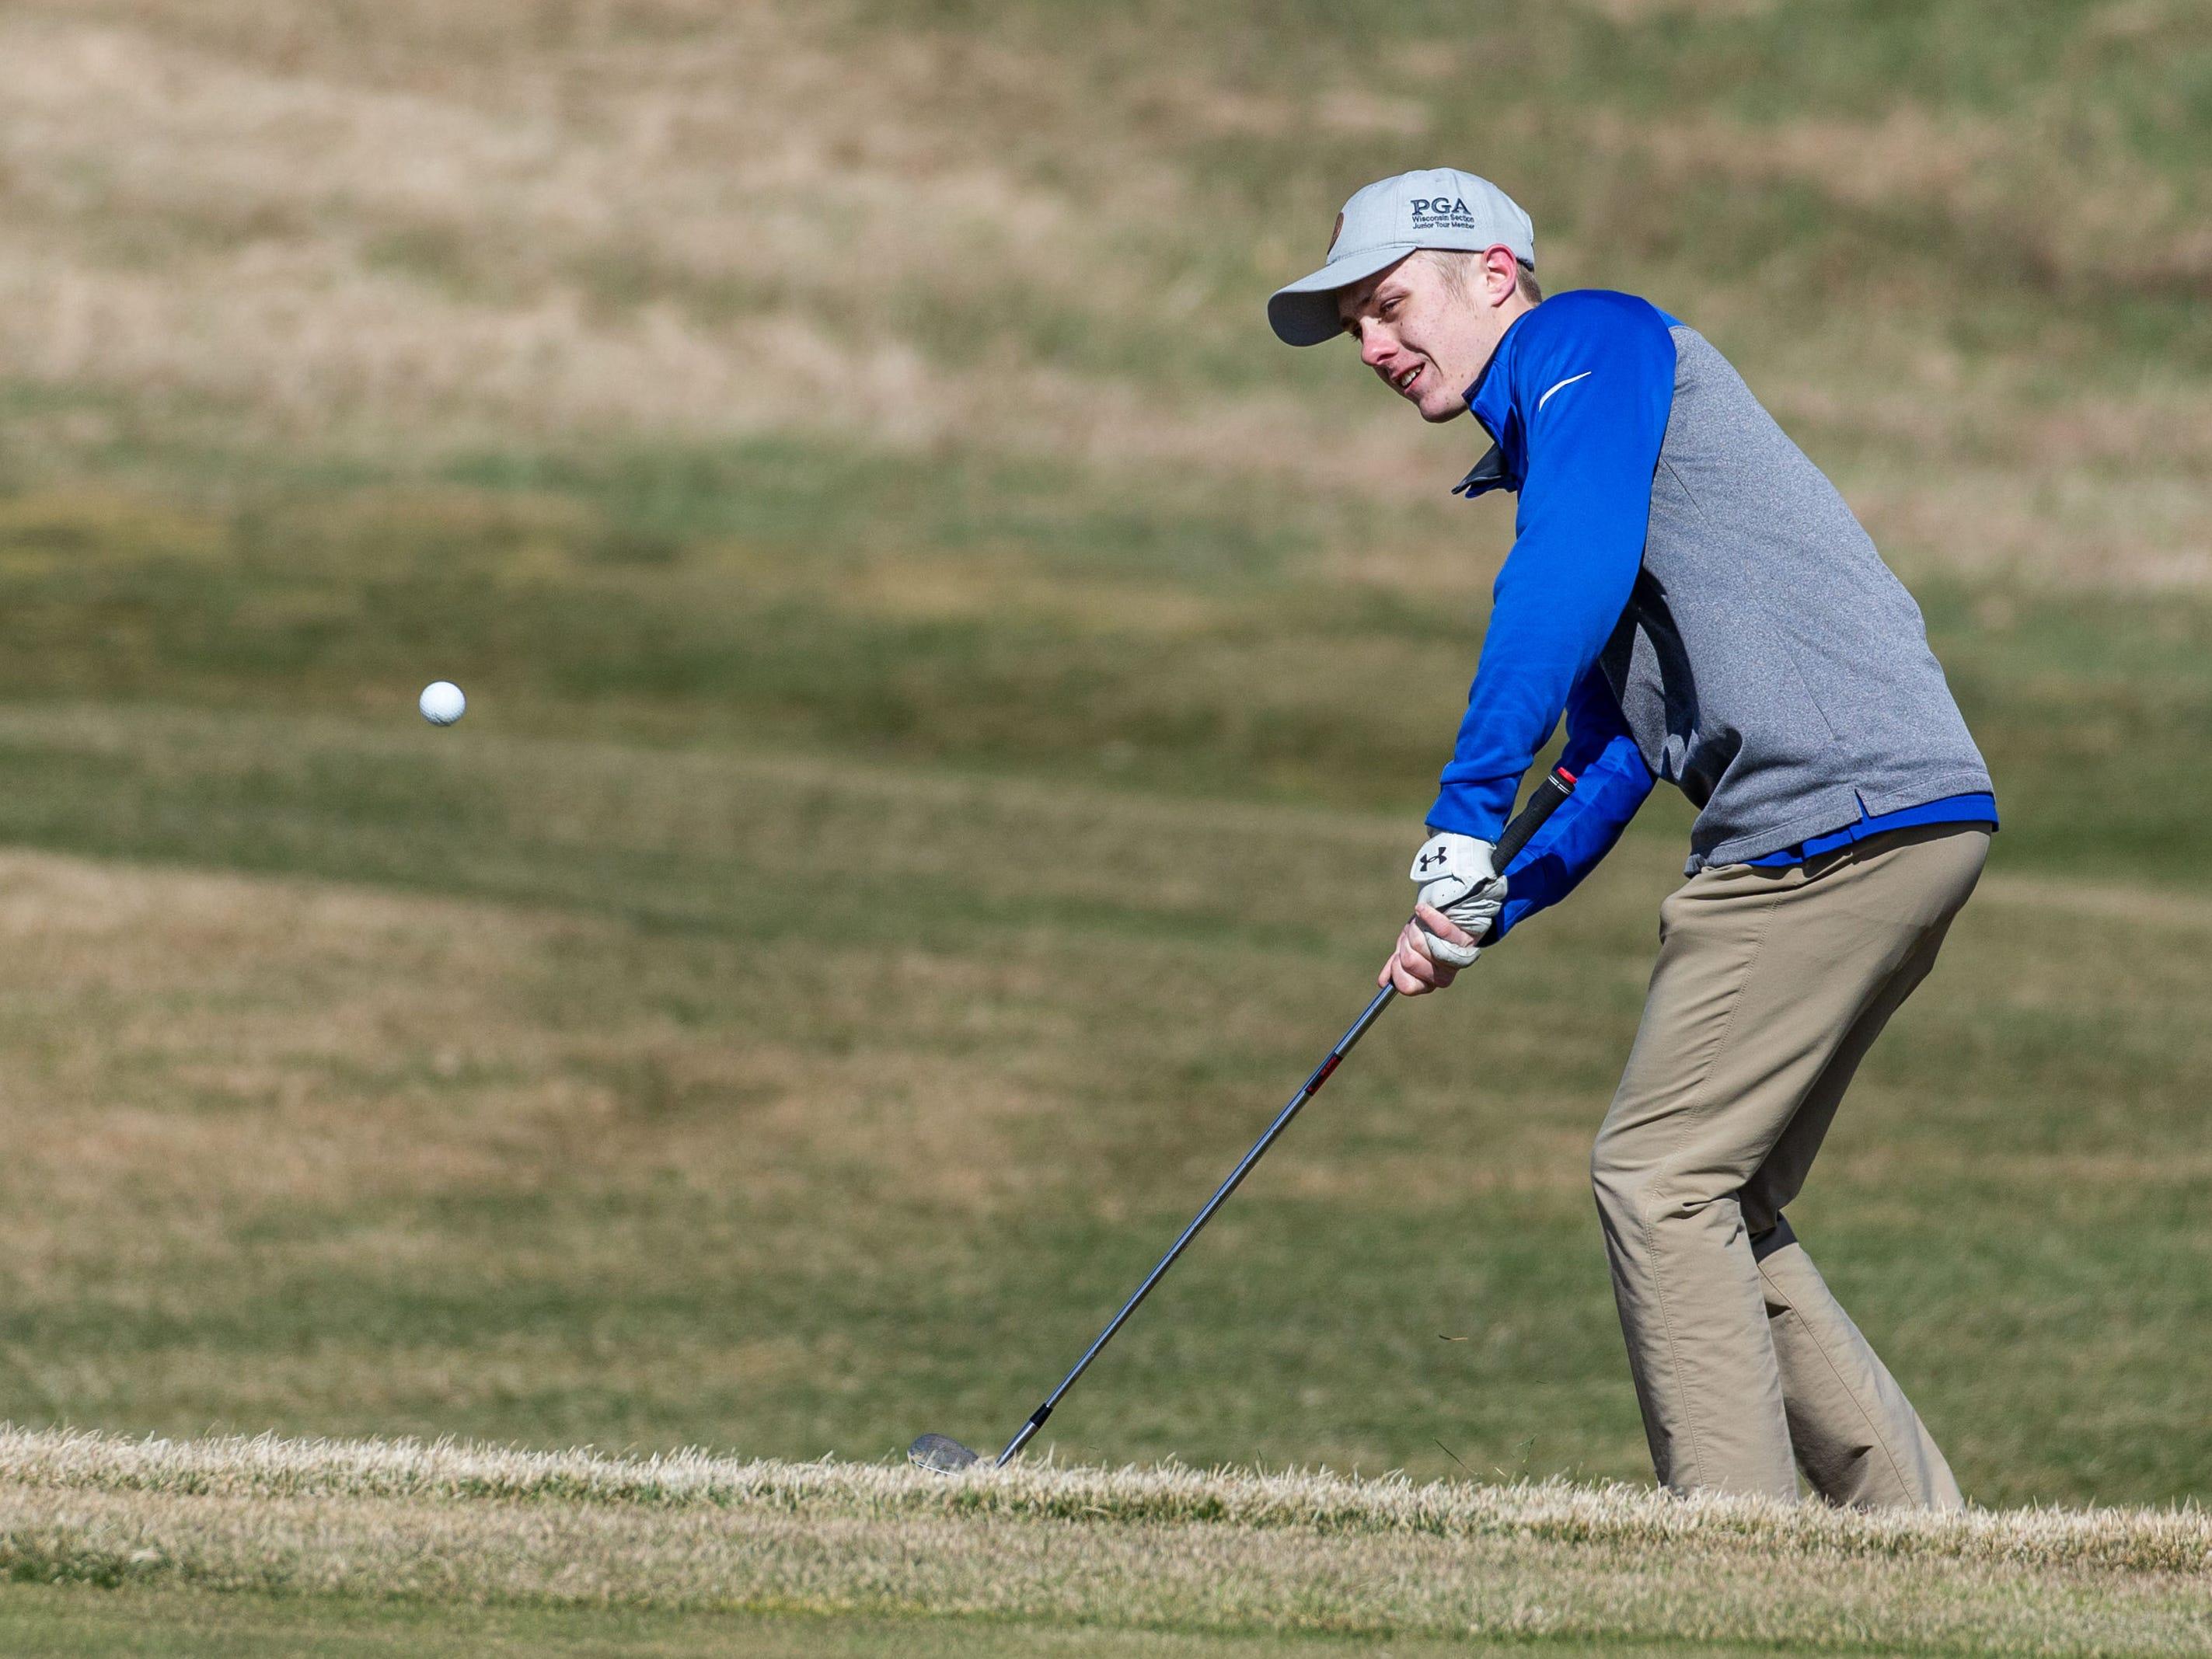 Catholic Memorial golfer Jacob Neques competes in the Catholic Memorial 2019 Crusader Invitational at Broadlands Golf Club in North Prairie on Saturday, April 13, 2019.